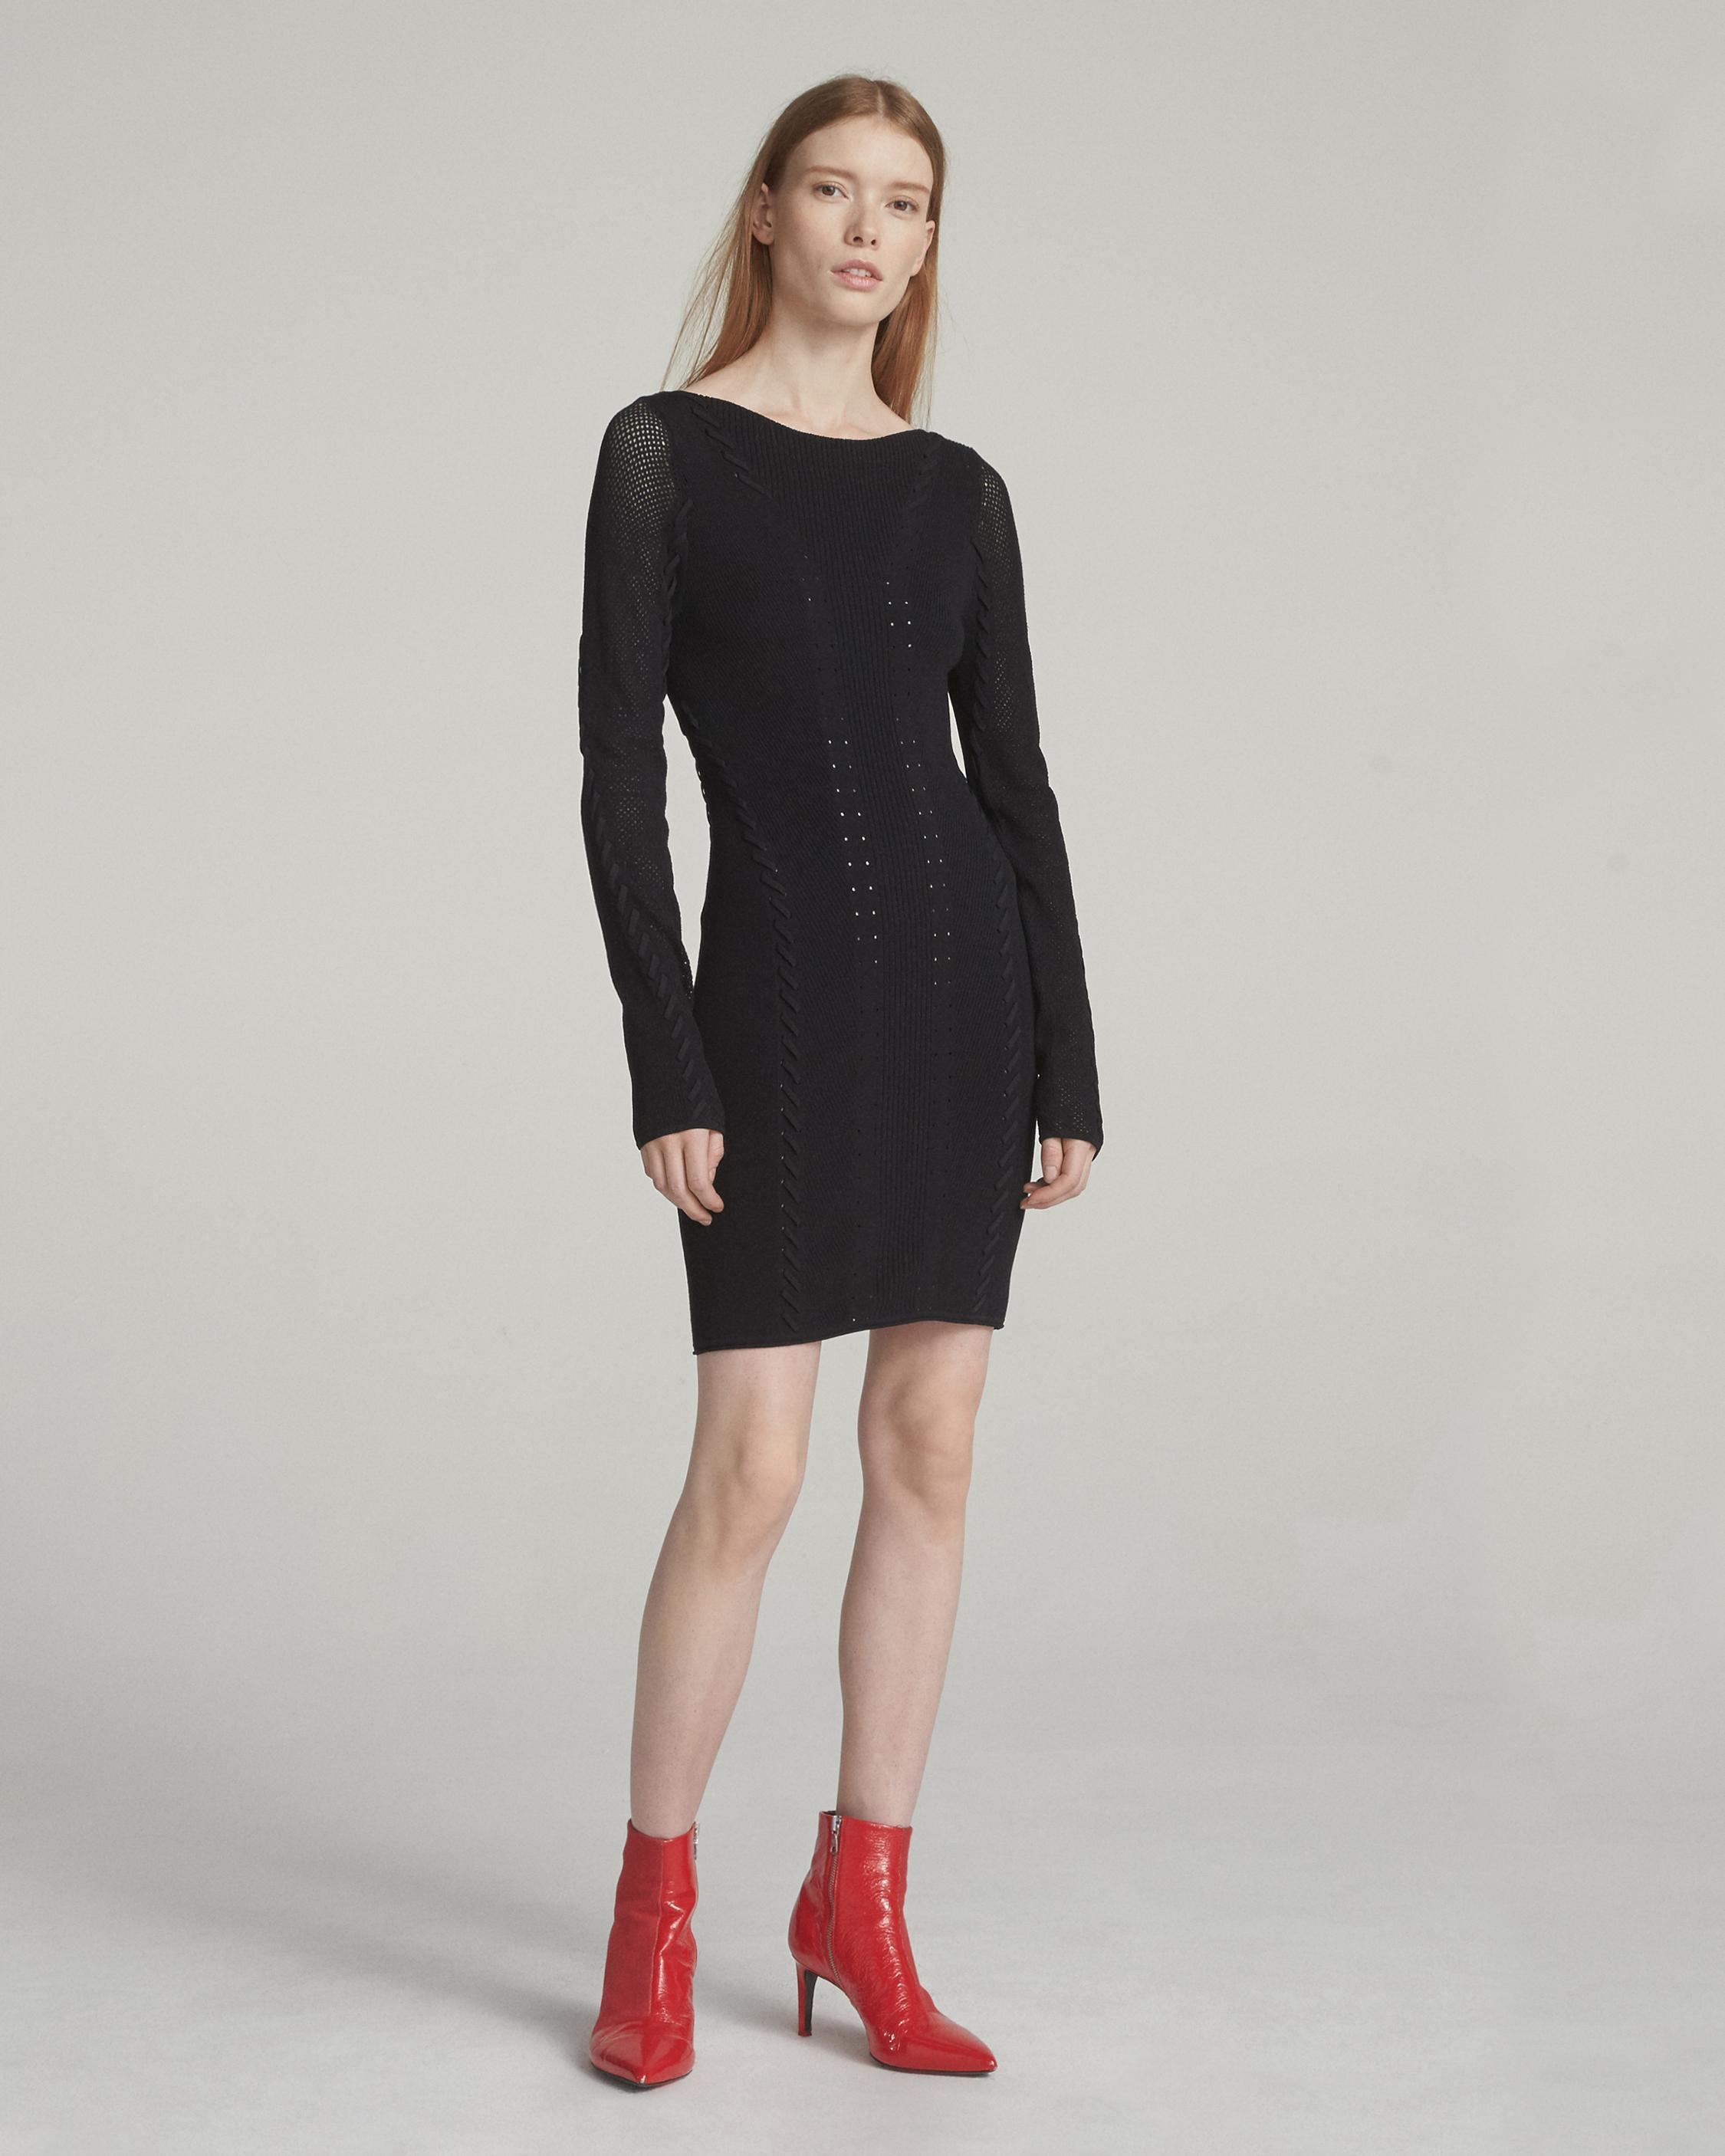 Best Place To Buy Rag & Bone Mesh Mini Dress Outlet With Paypal Order Popular Online Shop For Online Outlet Enjoy CrVEdFfJd